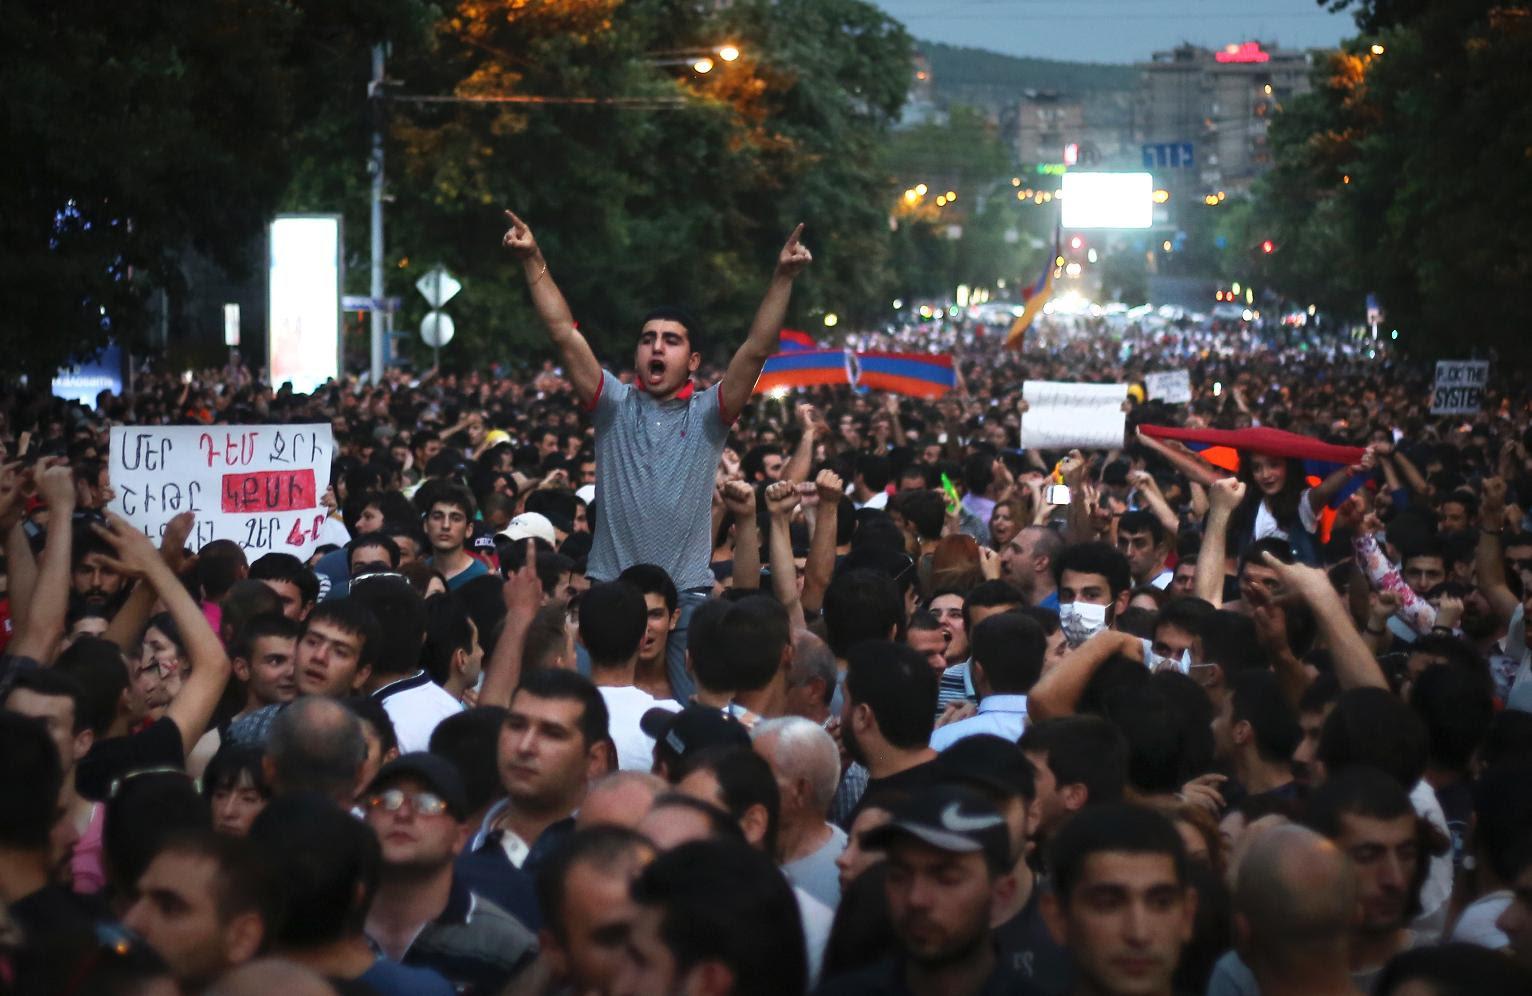 http://www.usnews.com/cmsmedia/79/7a51e0f0e272d1663fff92e3263037/media:91934d8ebc51450d9a80df9480b8167eArmeniaProtest.JPEG